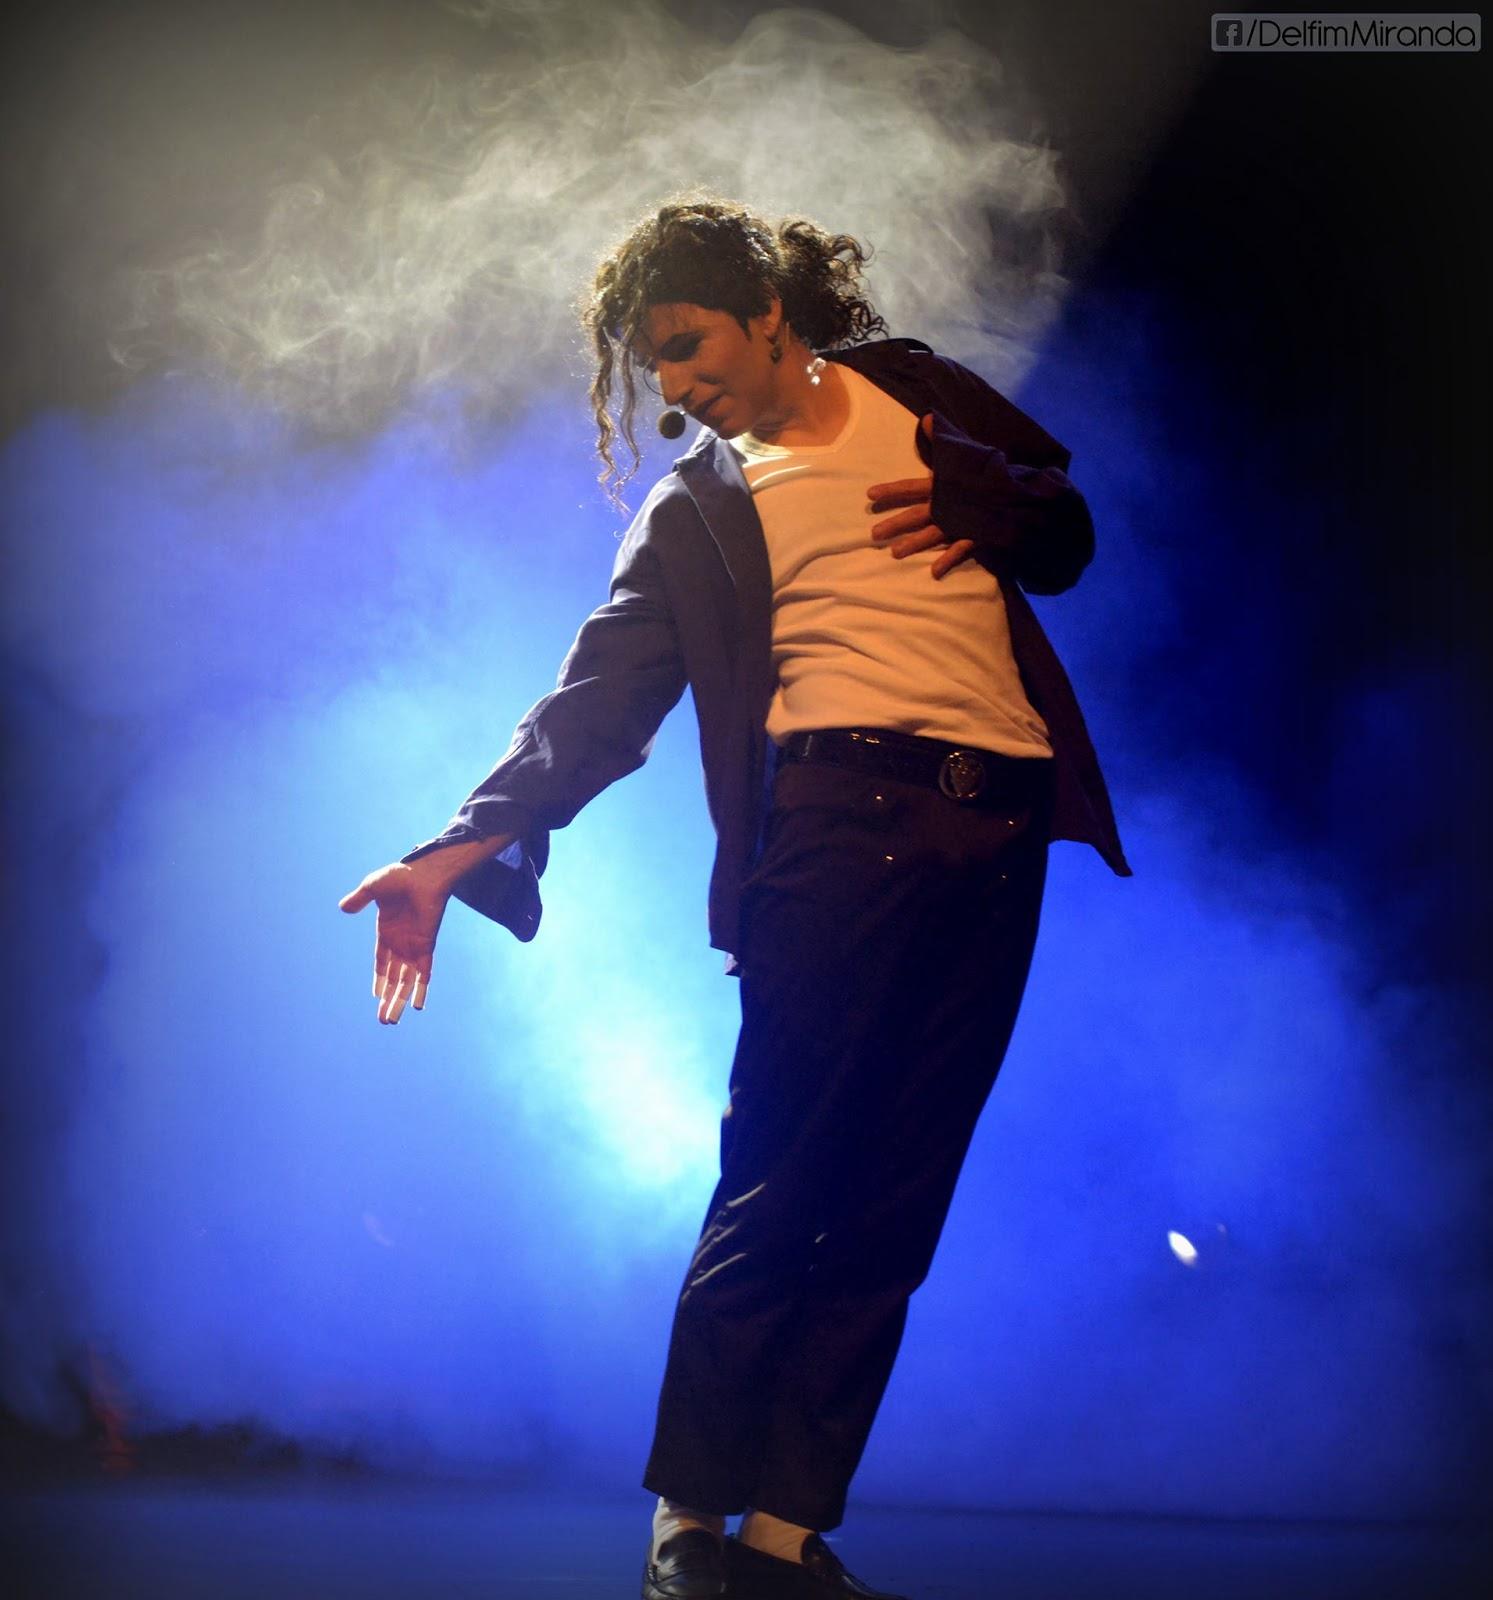 Delfim Miranda - Michael Jackson Tribute - I Just Can't Stop Loving You